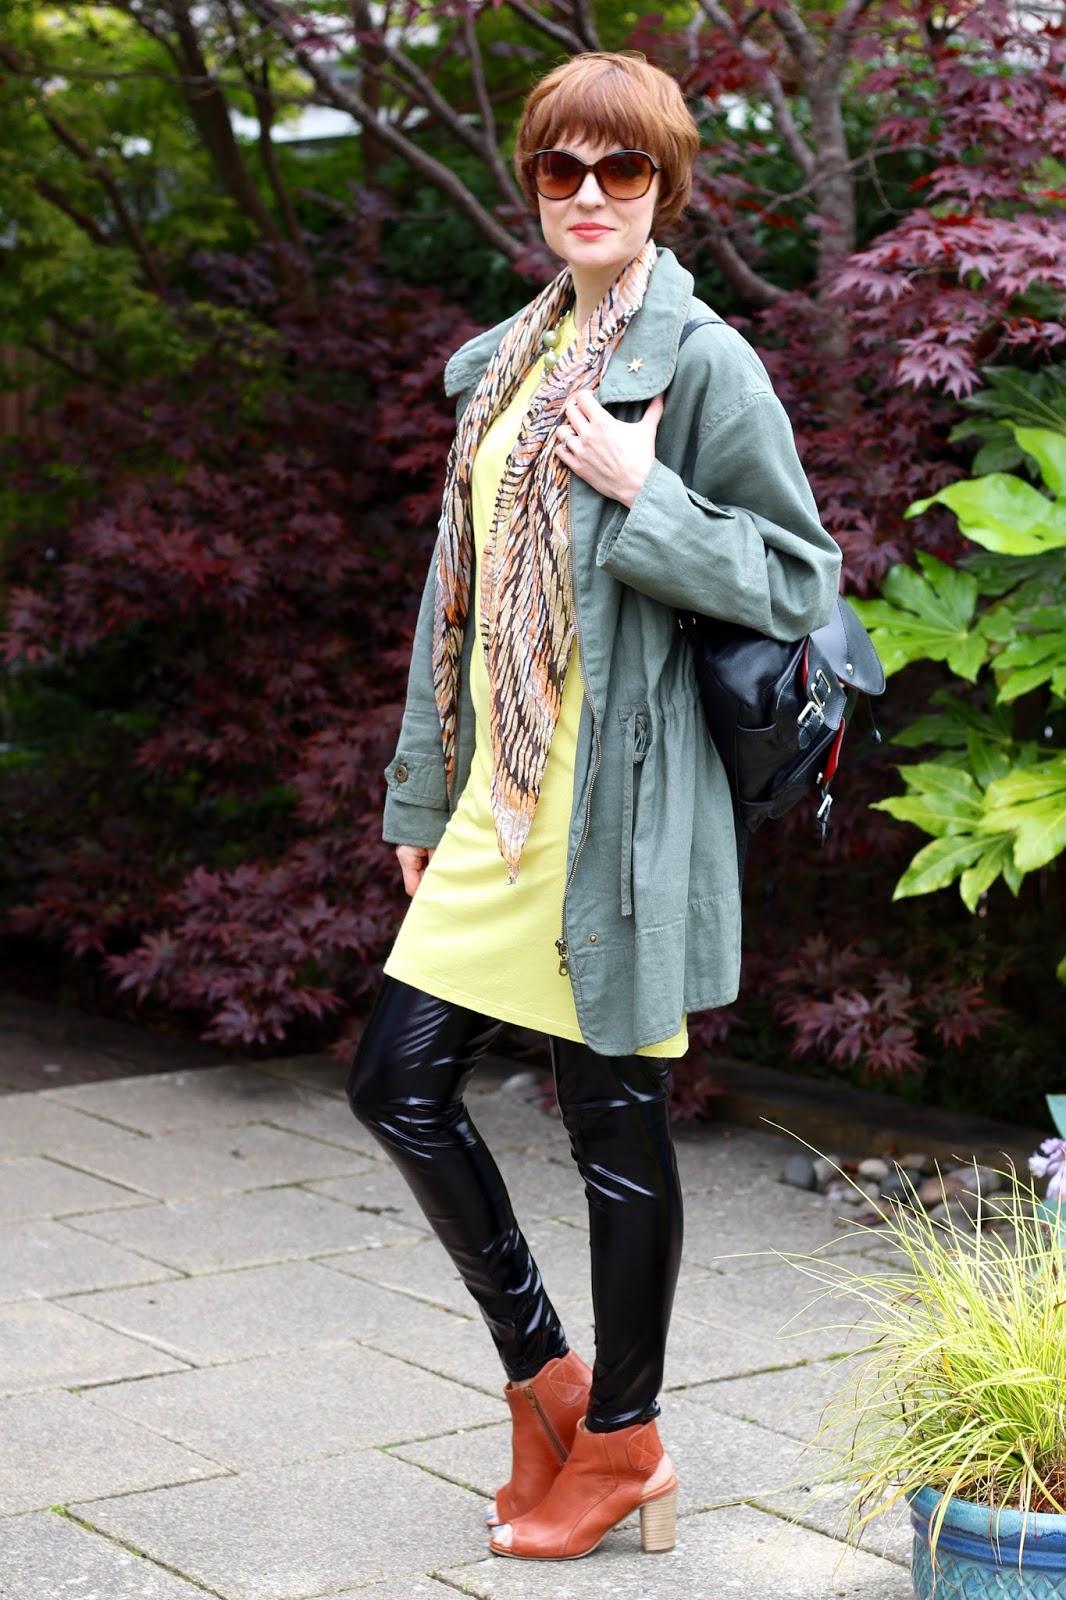 Fake Fabulous | A nod to Mod | Oversized Khaki jacket, yellow t-shirt dress, Black vinyl leggings, Tobacco peep-toe booties, over 40.